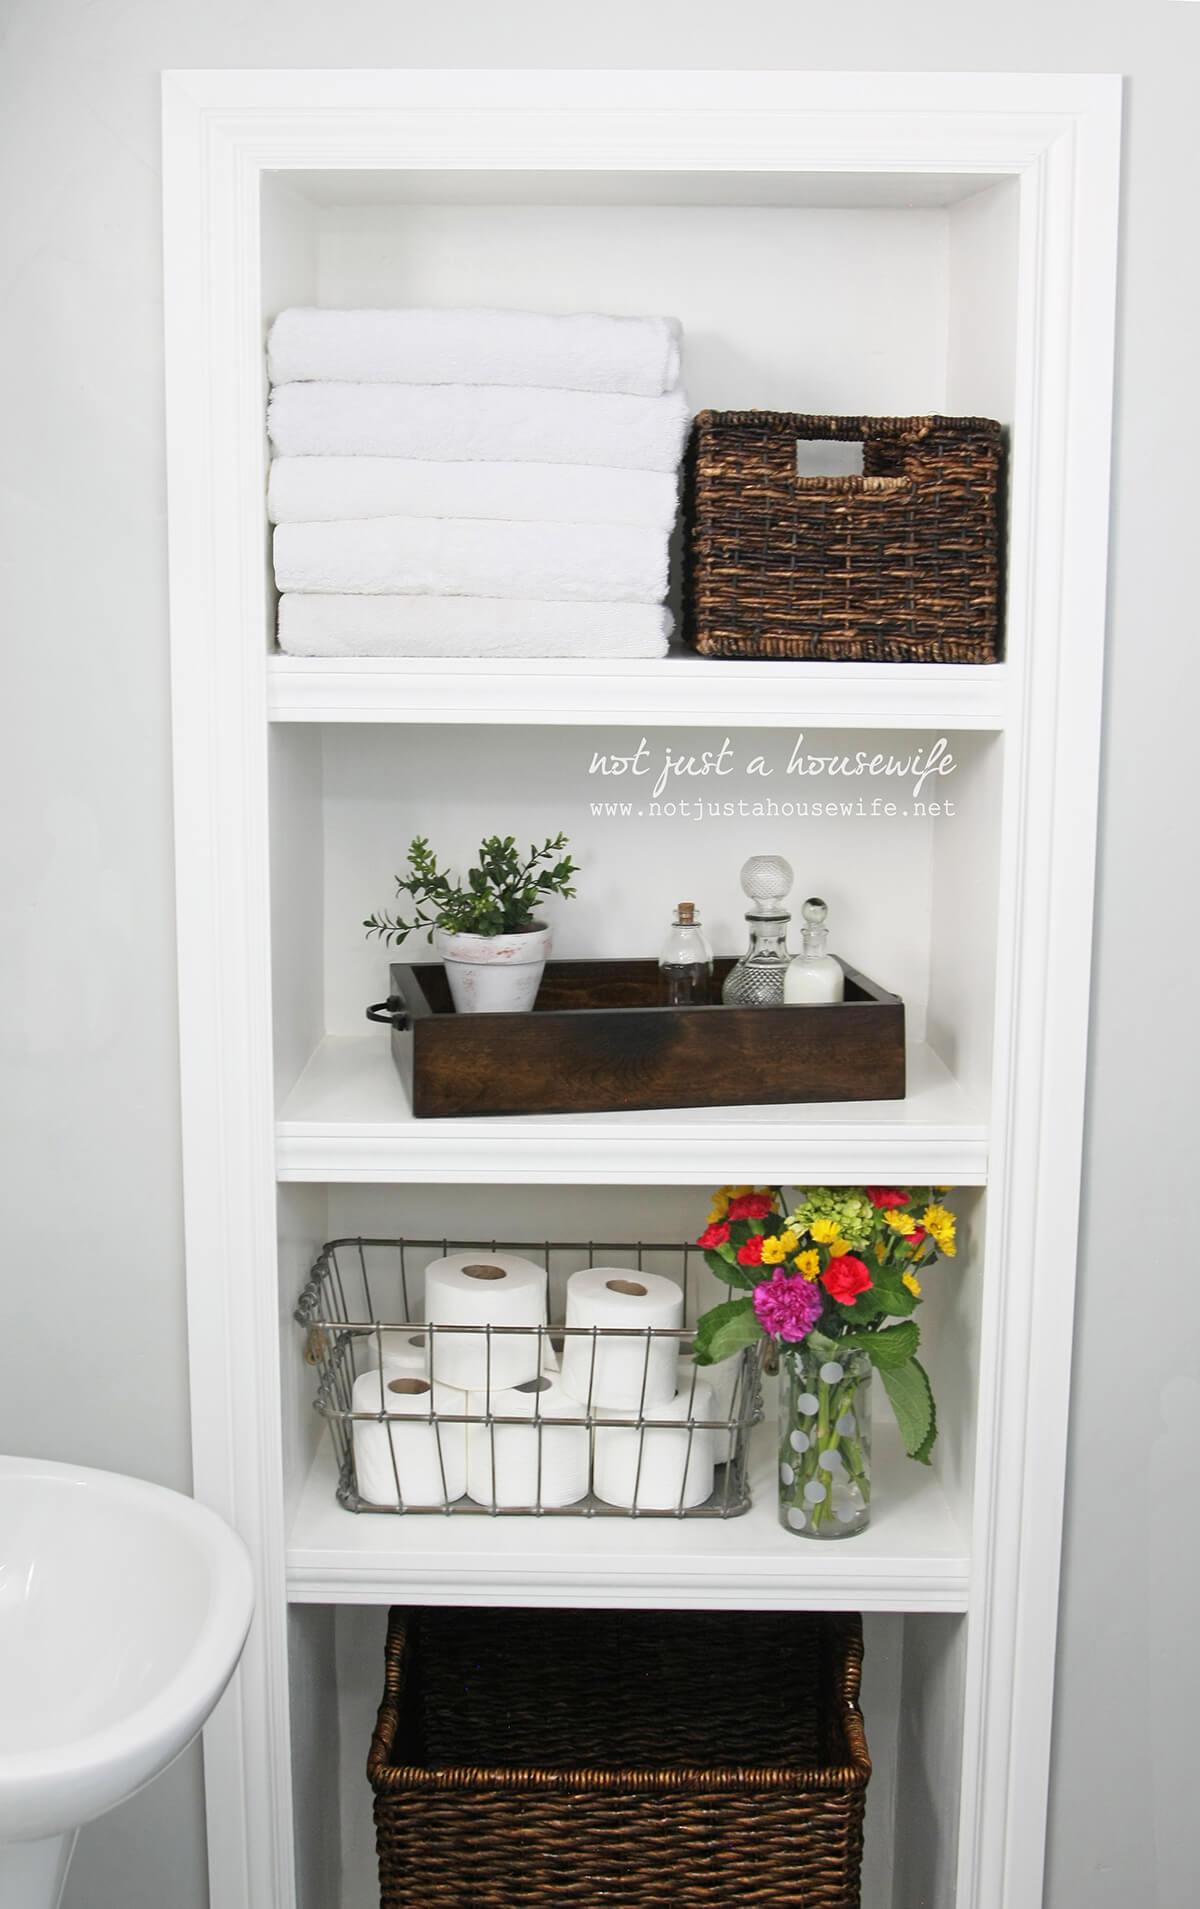 40-small-bathroom-storage-ideas-homebnc